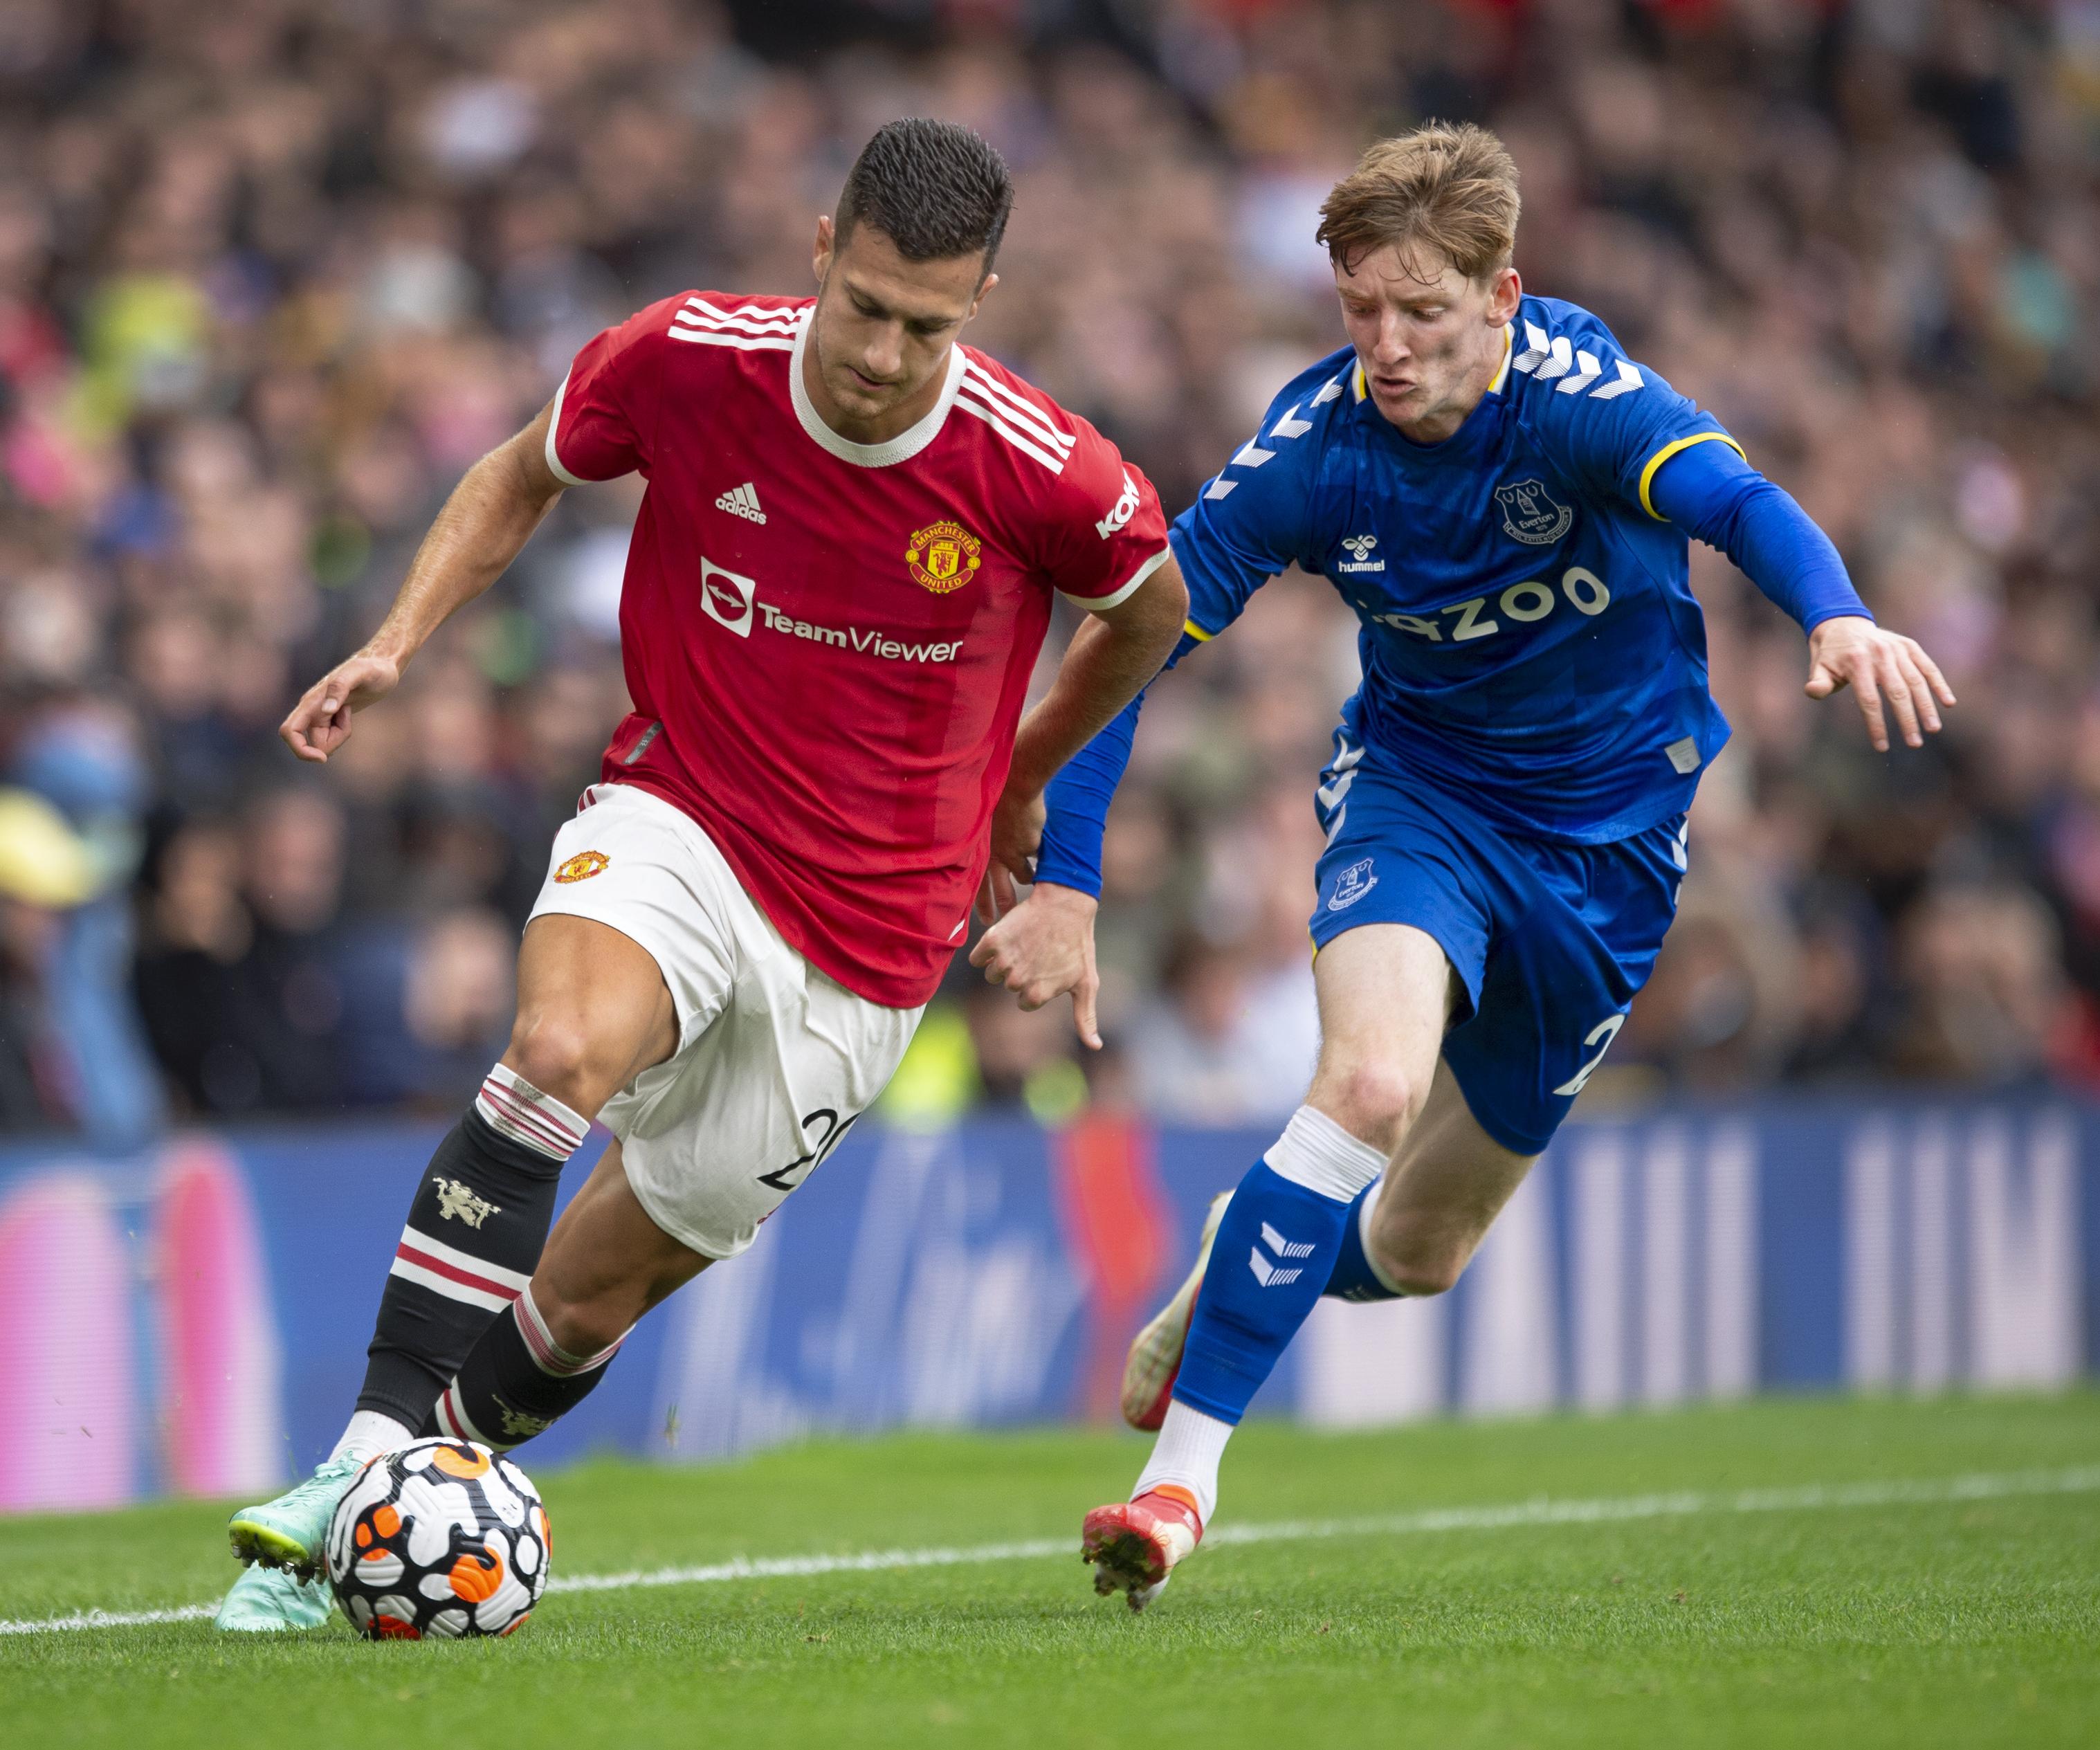 Manchester United v Everton - Pre-season Friendly